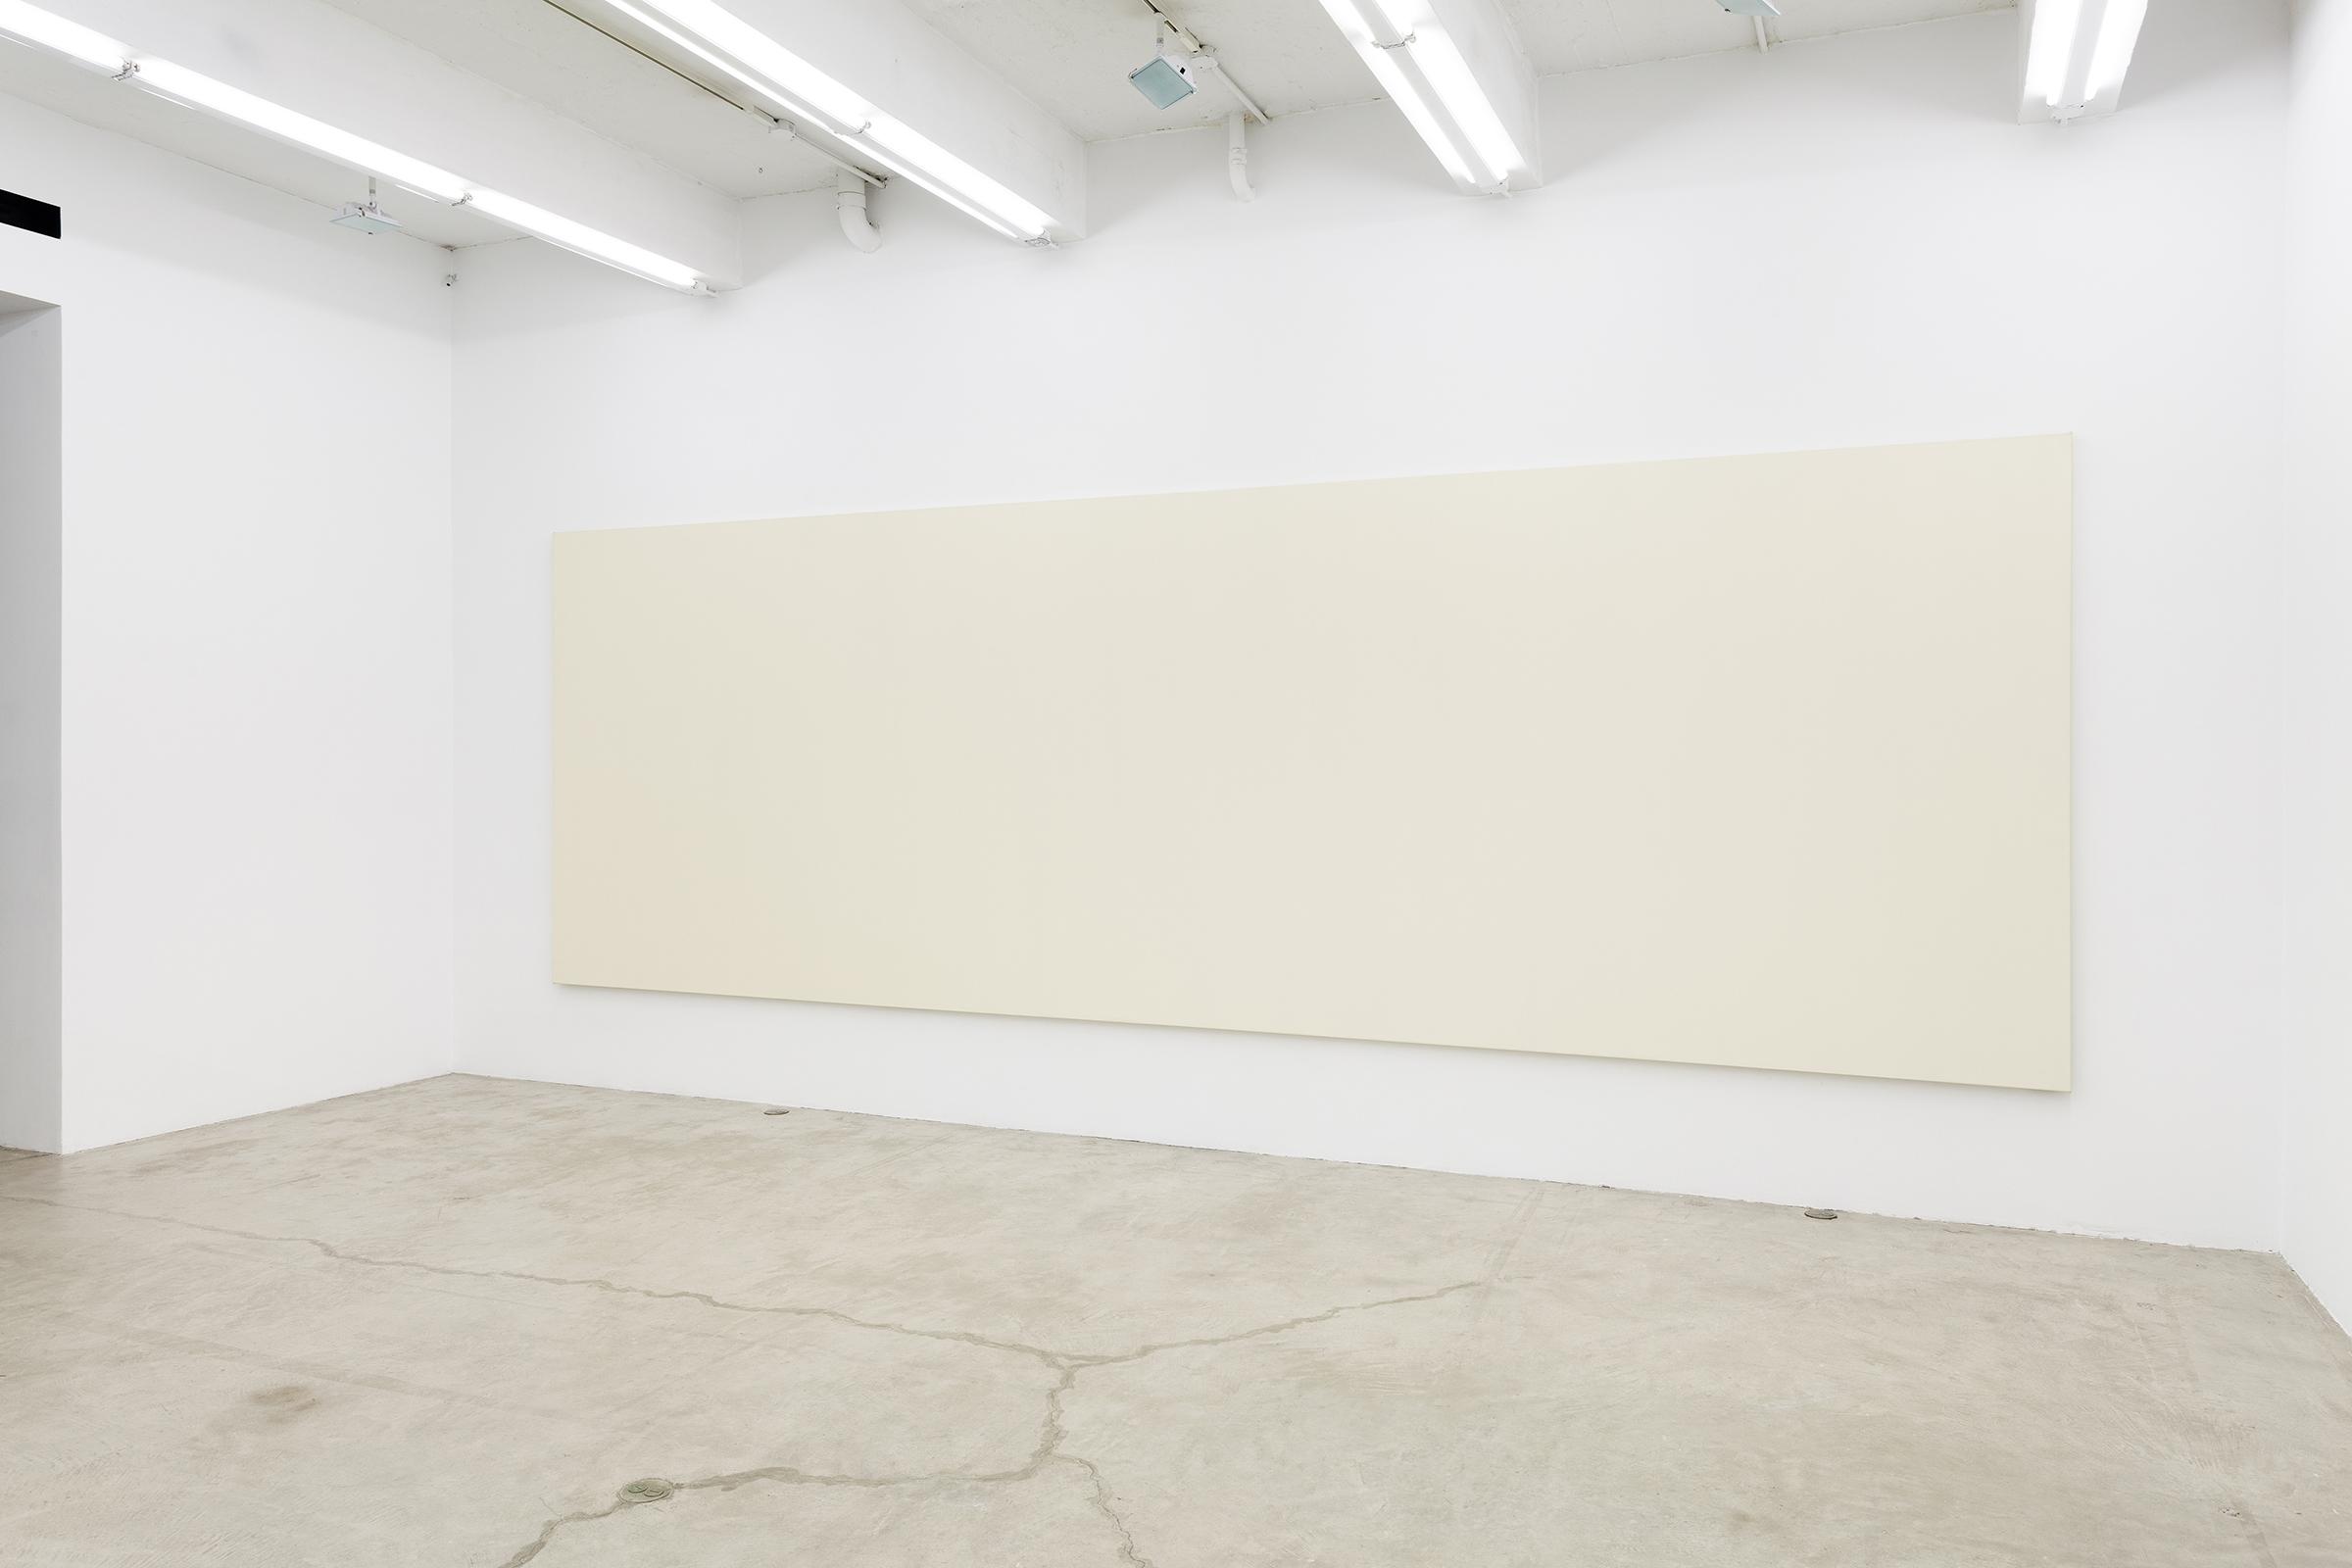 Installation view, Olivier Mosset , Martos Gallery, New York, 2013